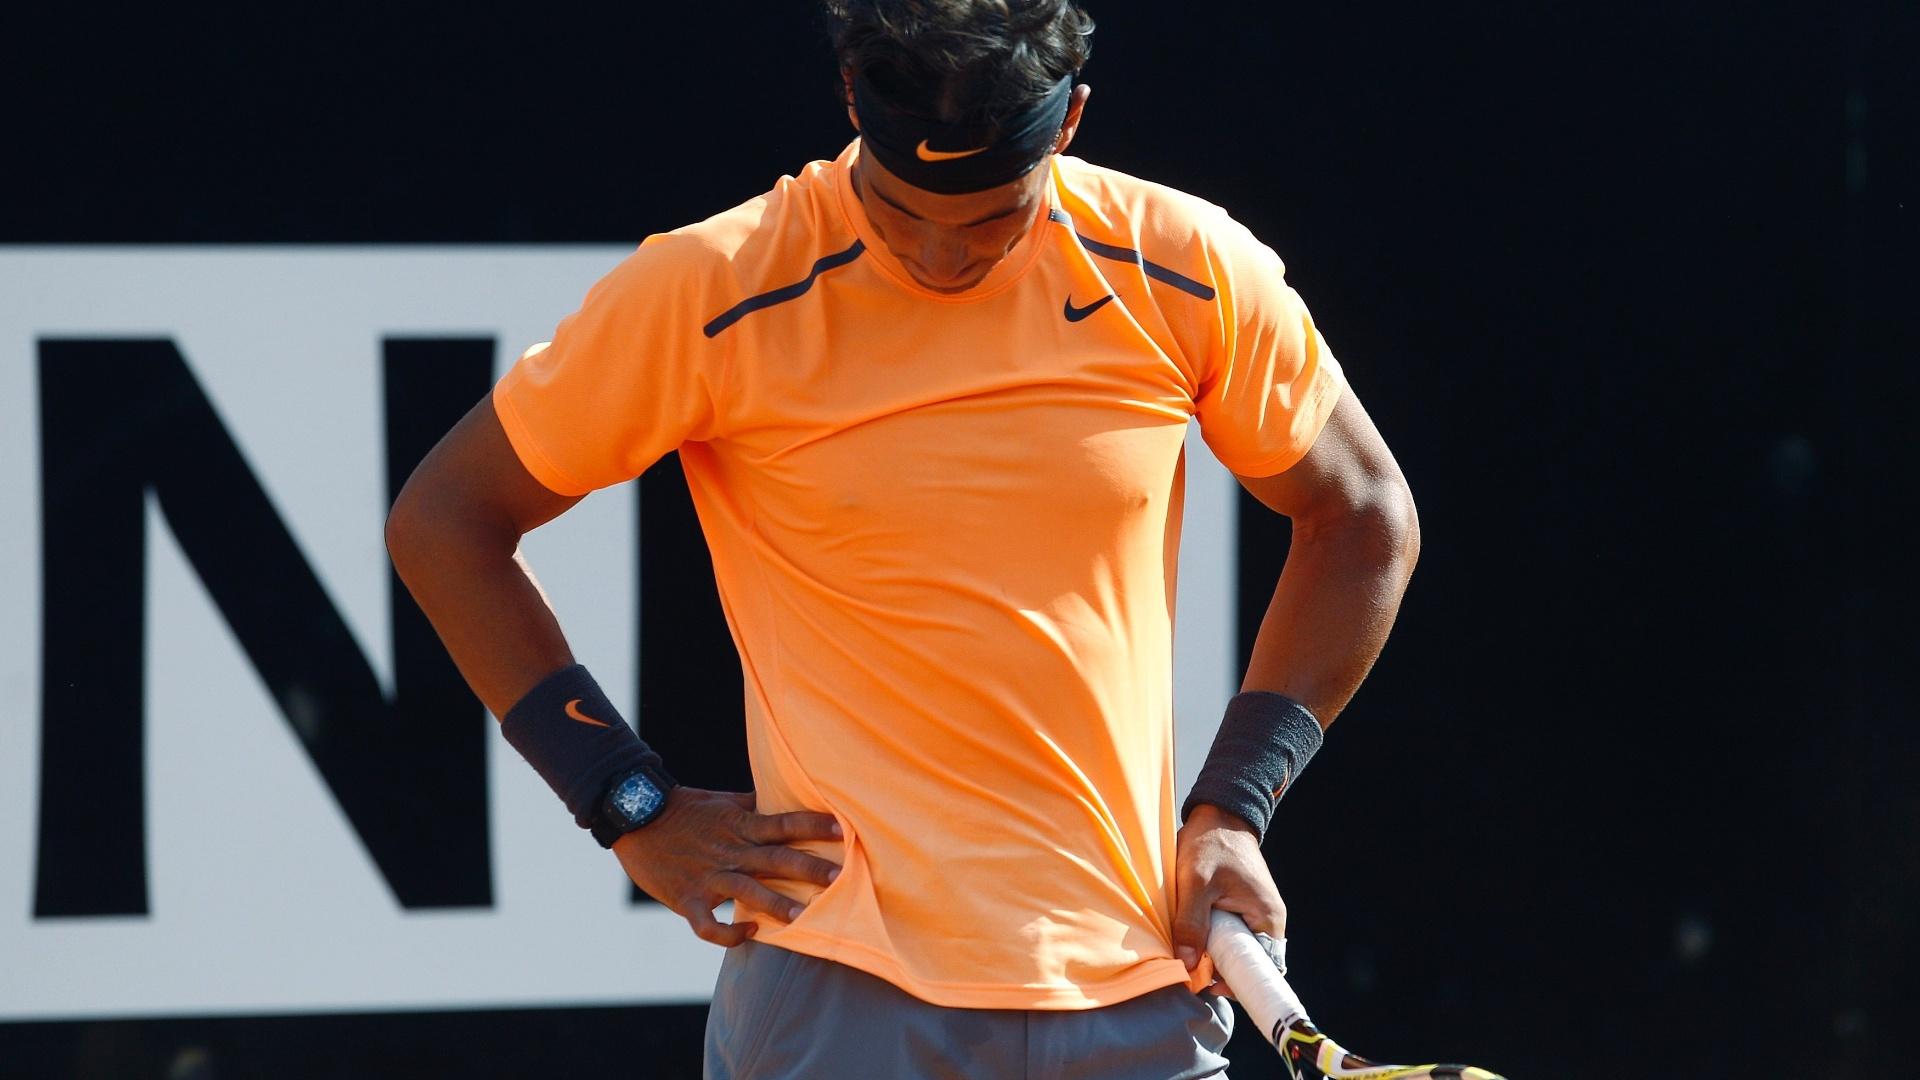 Espanhol Rafael Nadal lamenta erro na partida contra o compatriota David Ferrer